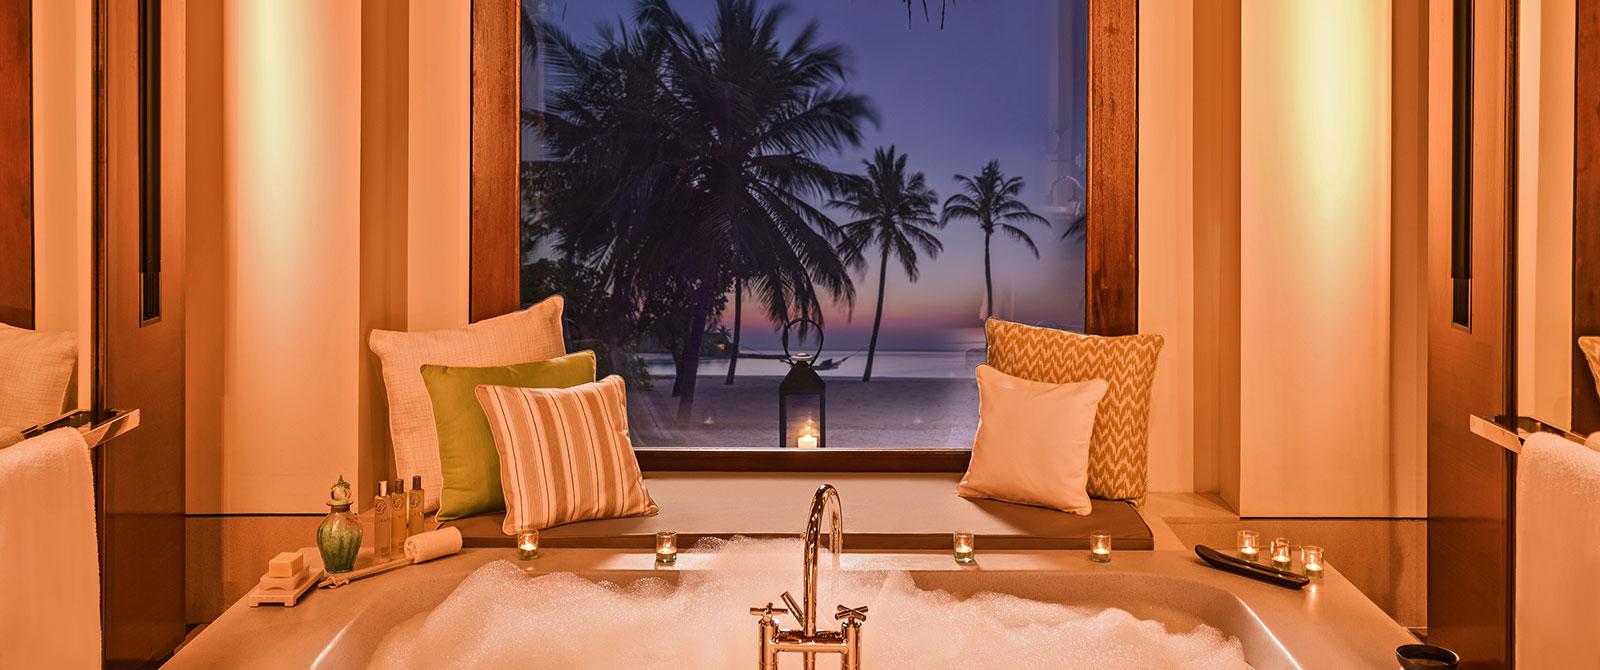 One&Only Reethi Rah Resort Maldives - Beach Villa Bath